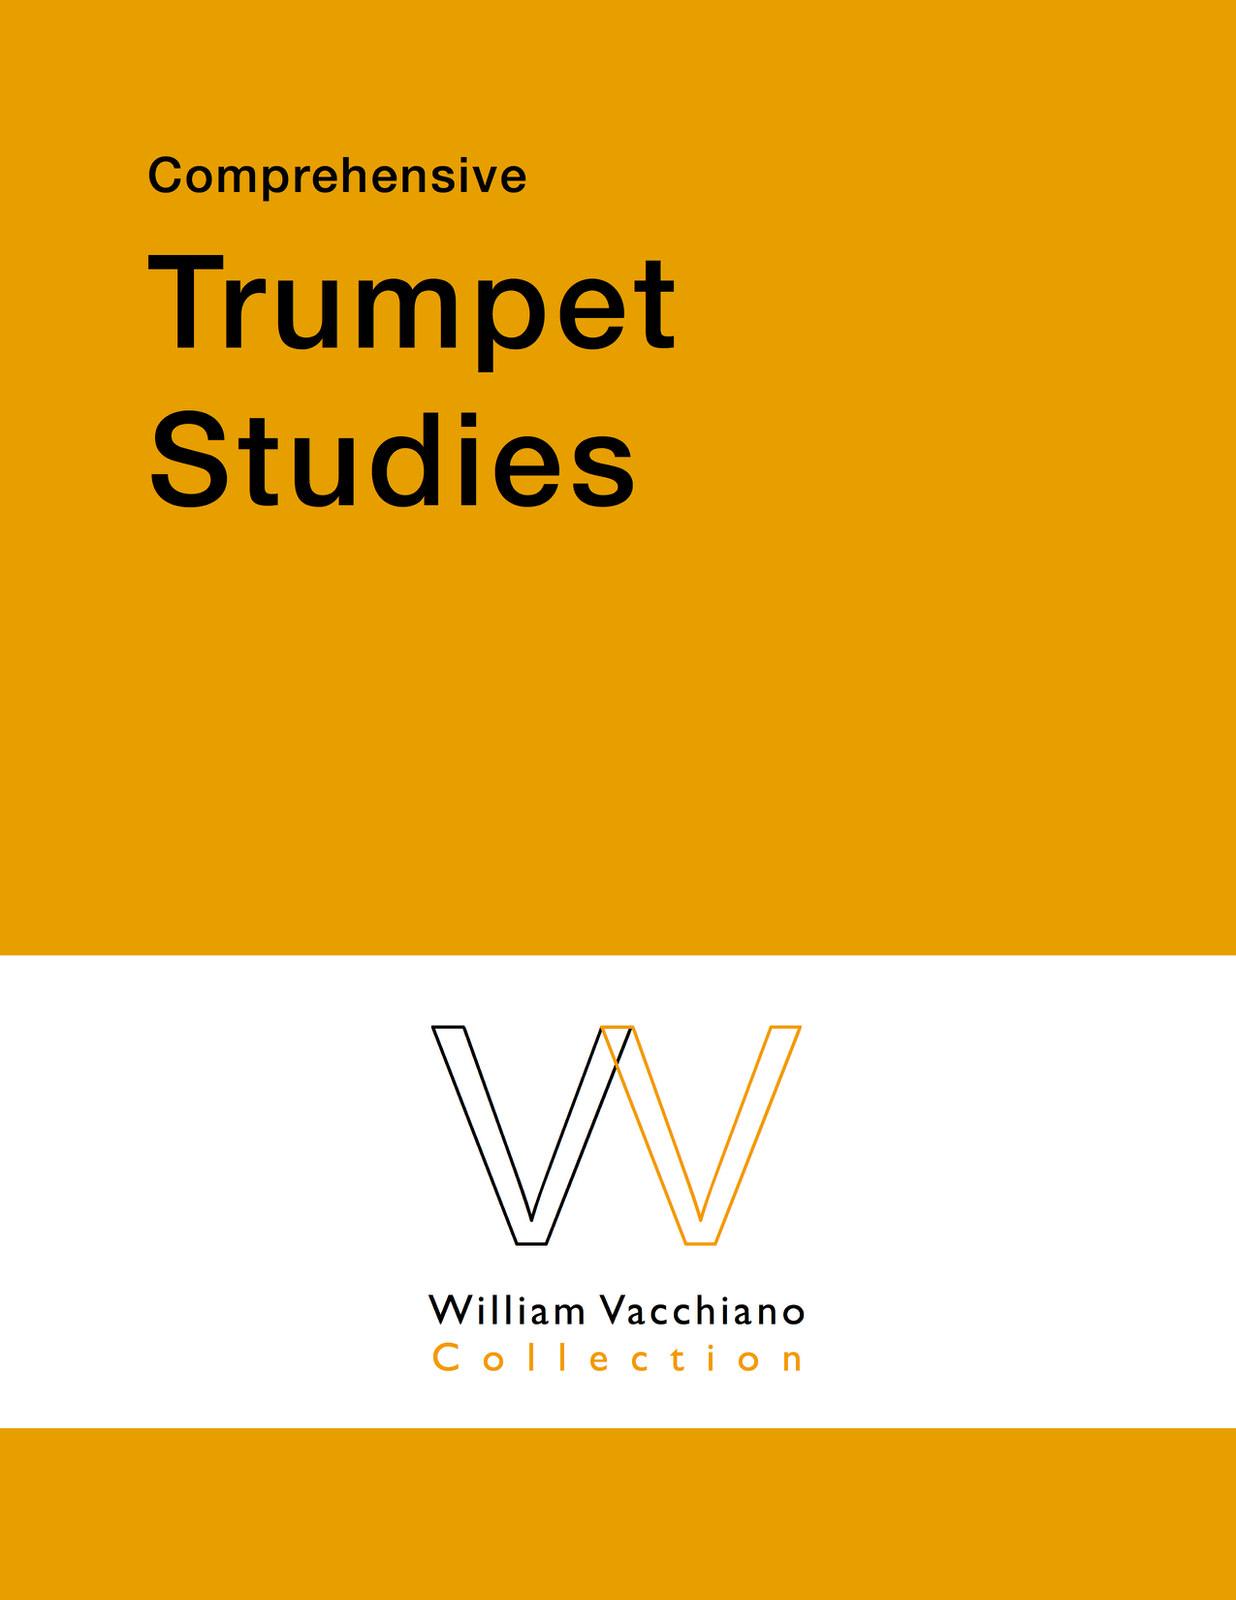 Vacchiano, Comprehensive Trumpet Studies